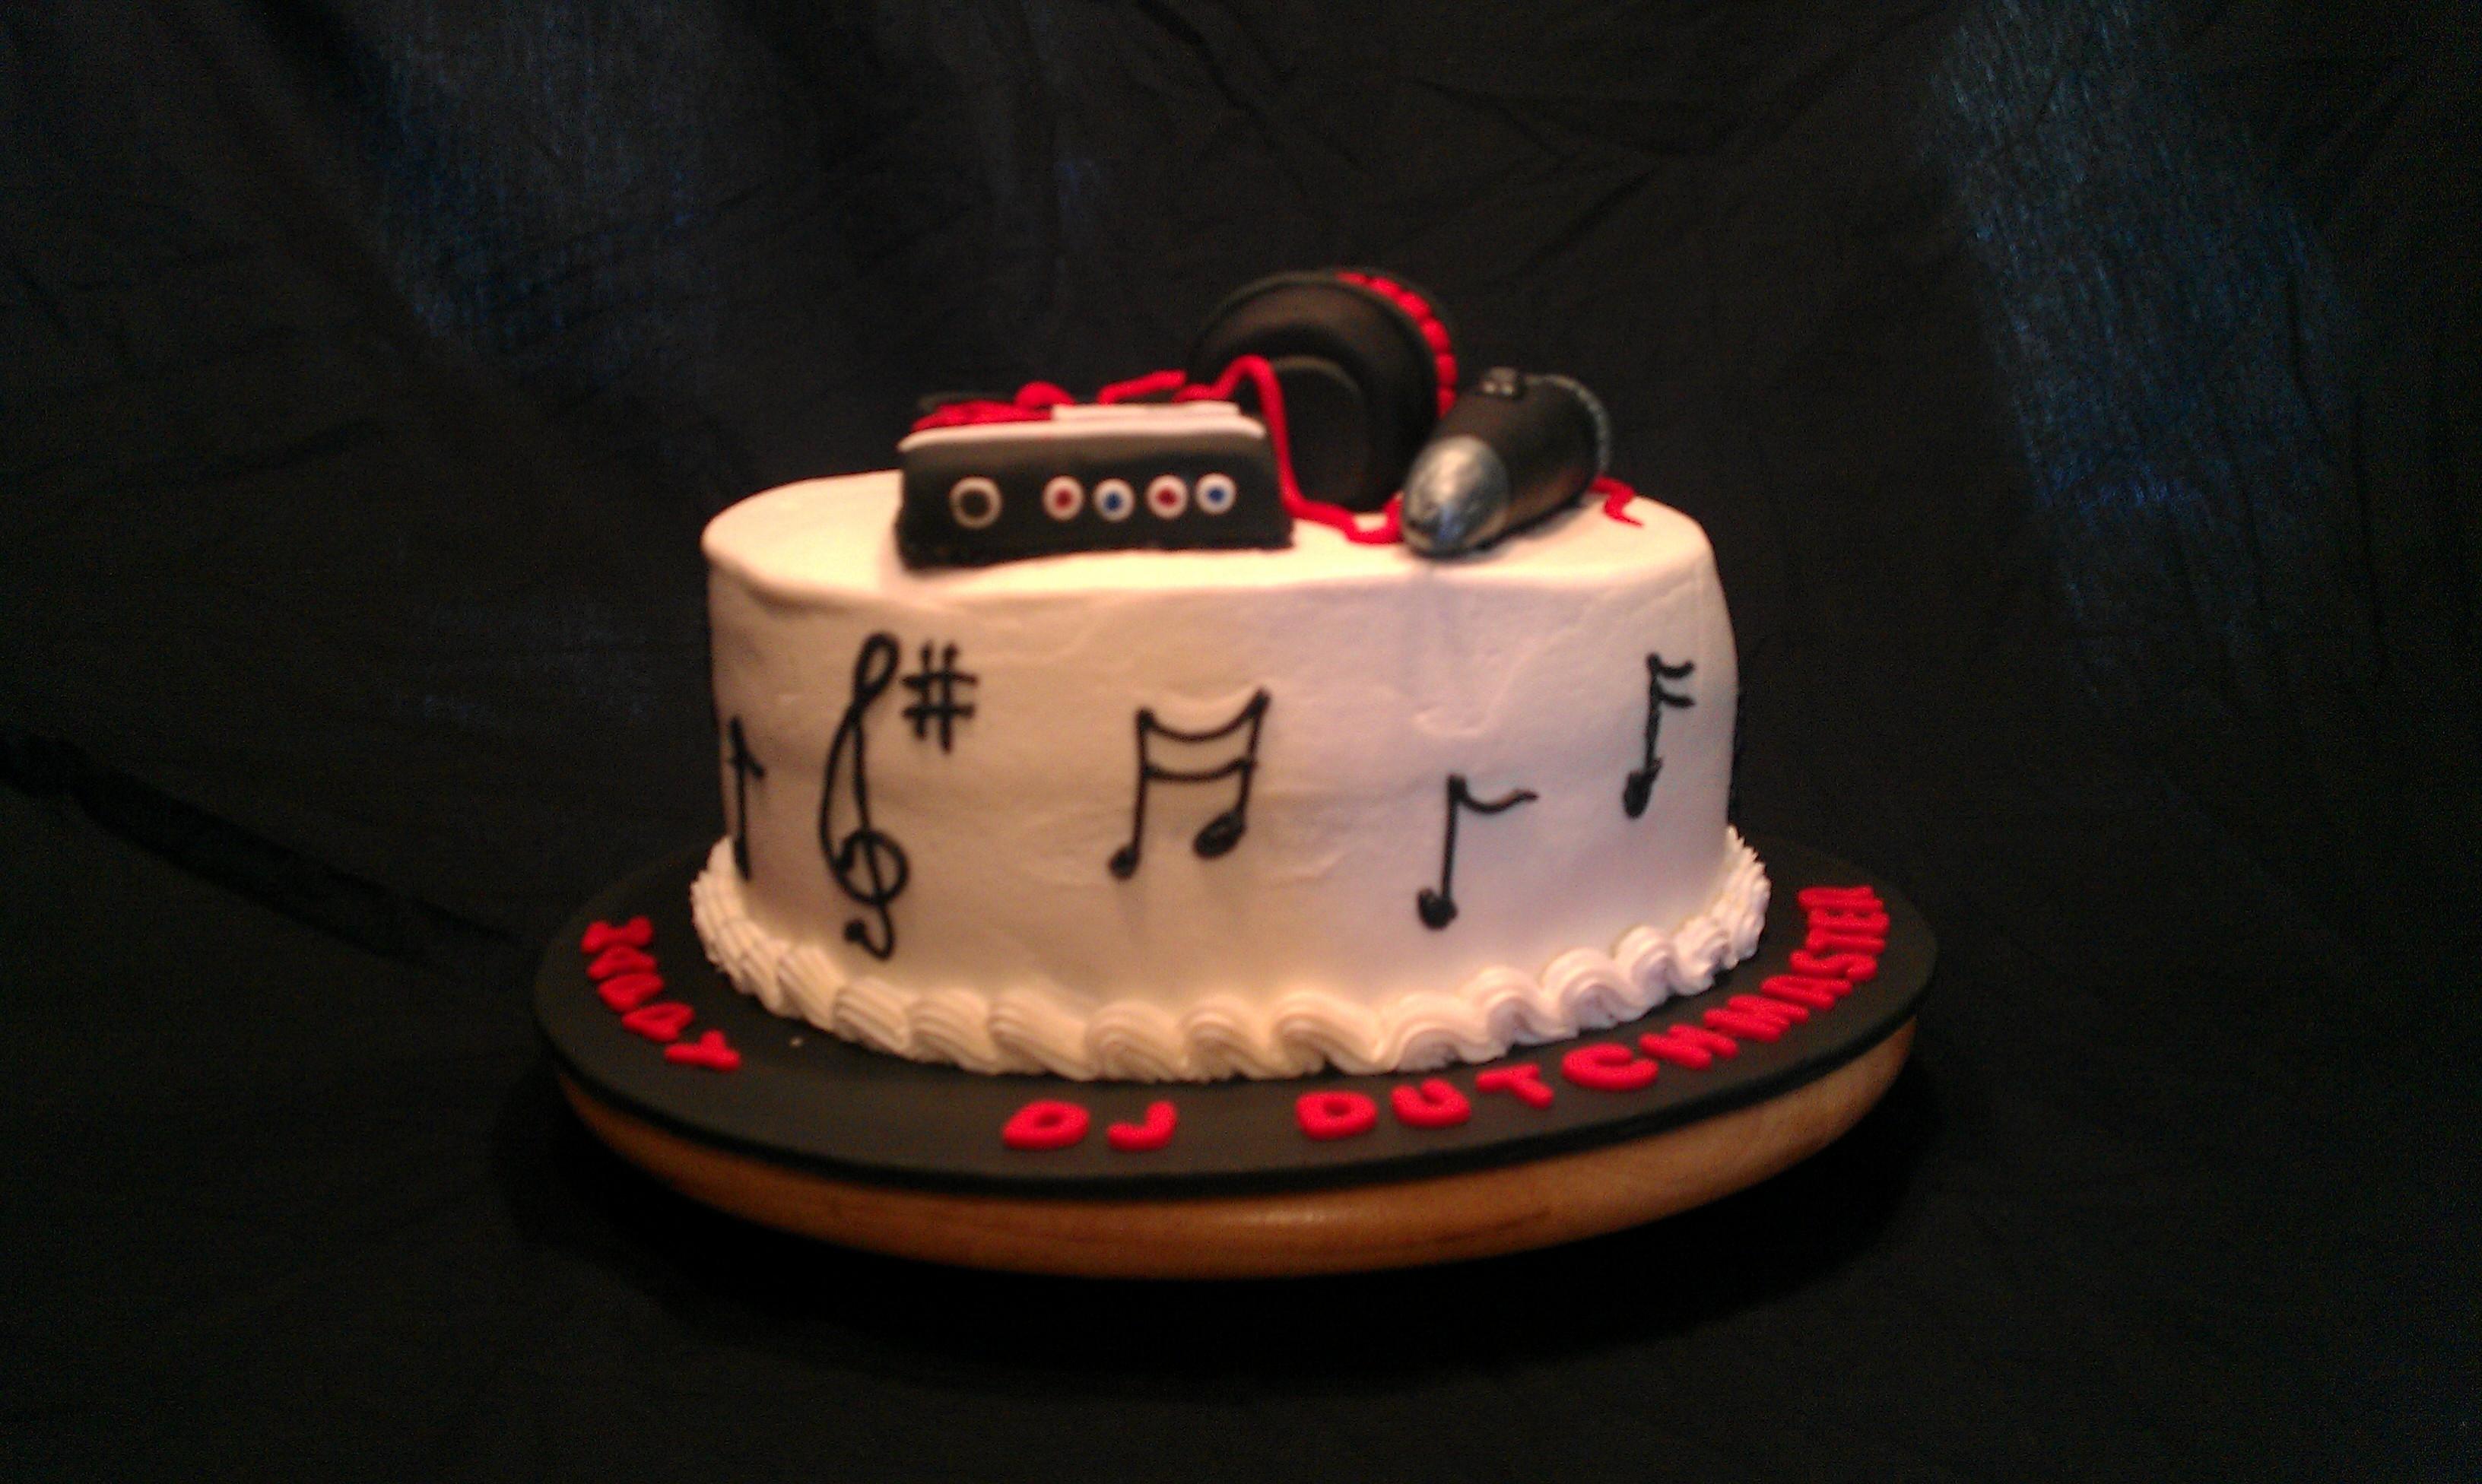 Themed Cake For Birthday : Dj Themed Birthday Cake - CakeCentral.com